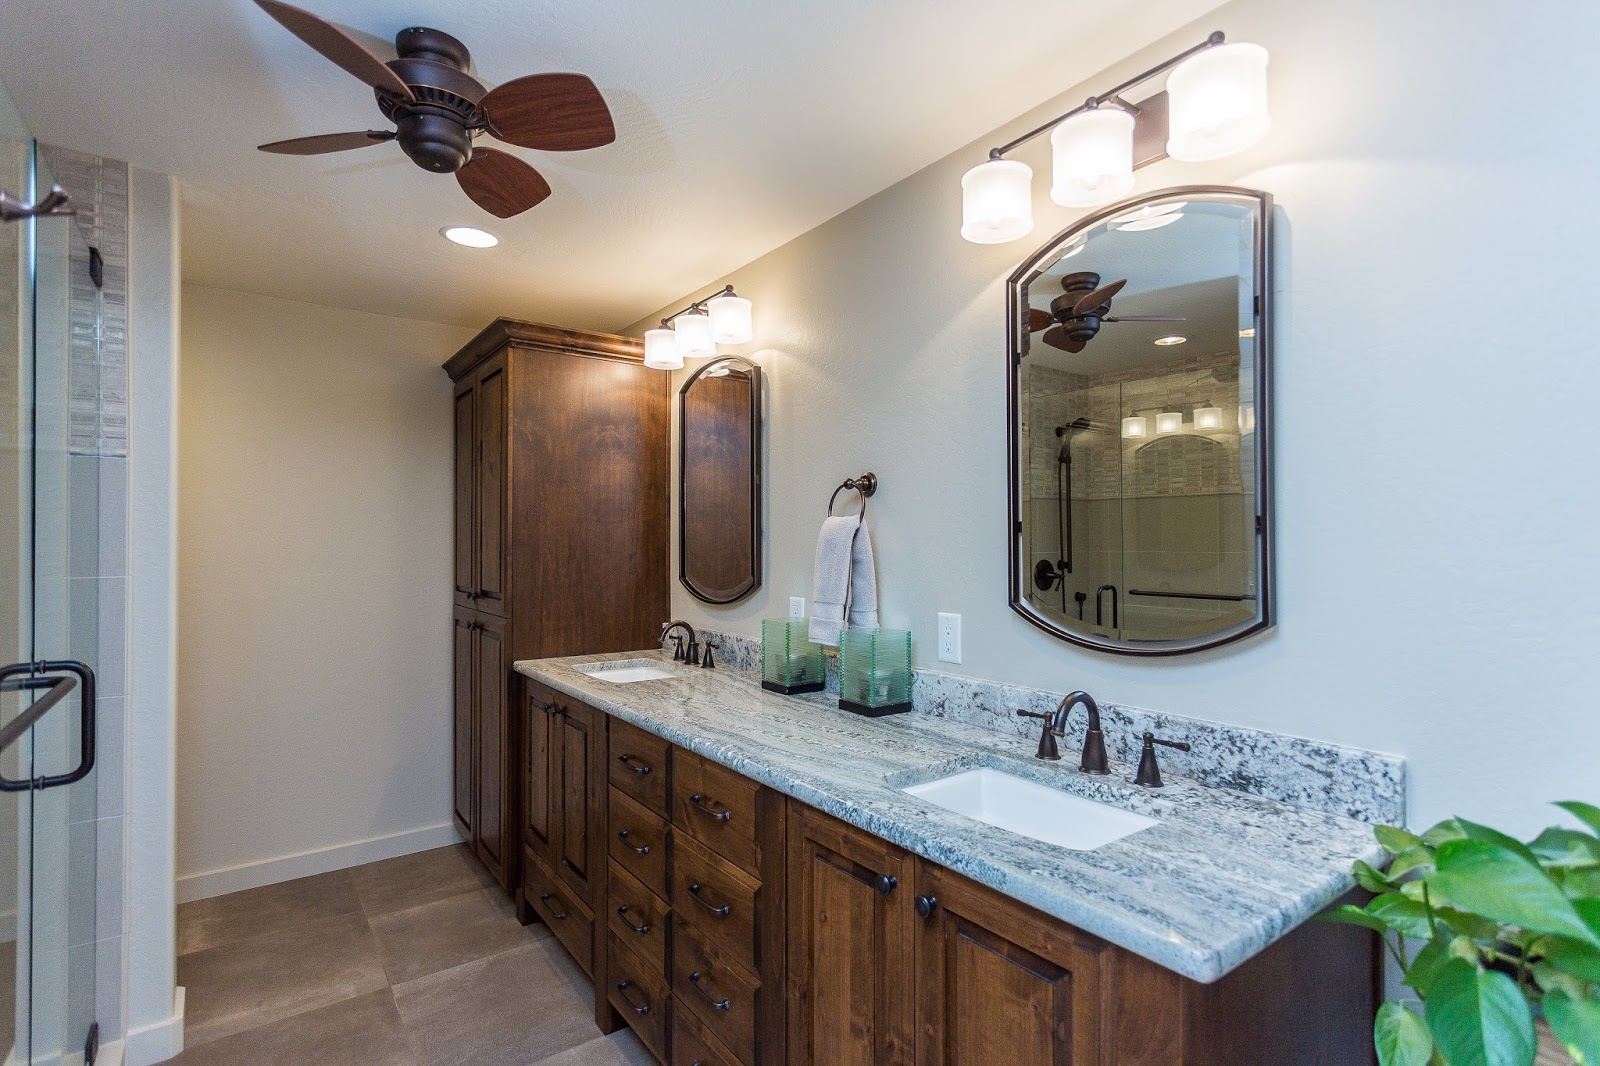 Kitchen Bath Design With Christie Board CKD CBD - Bathroom remodel prescott az